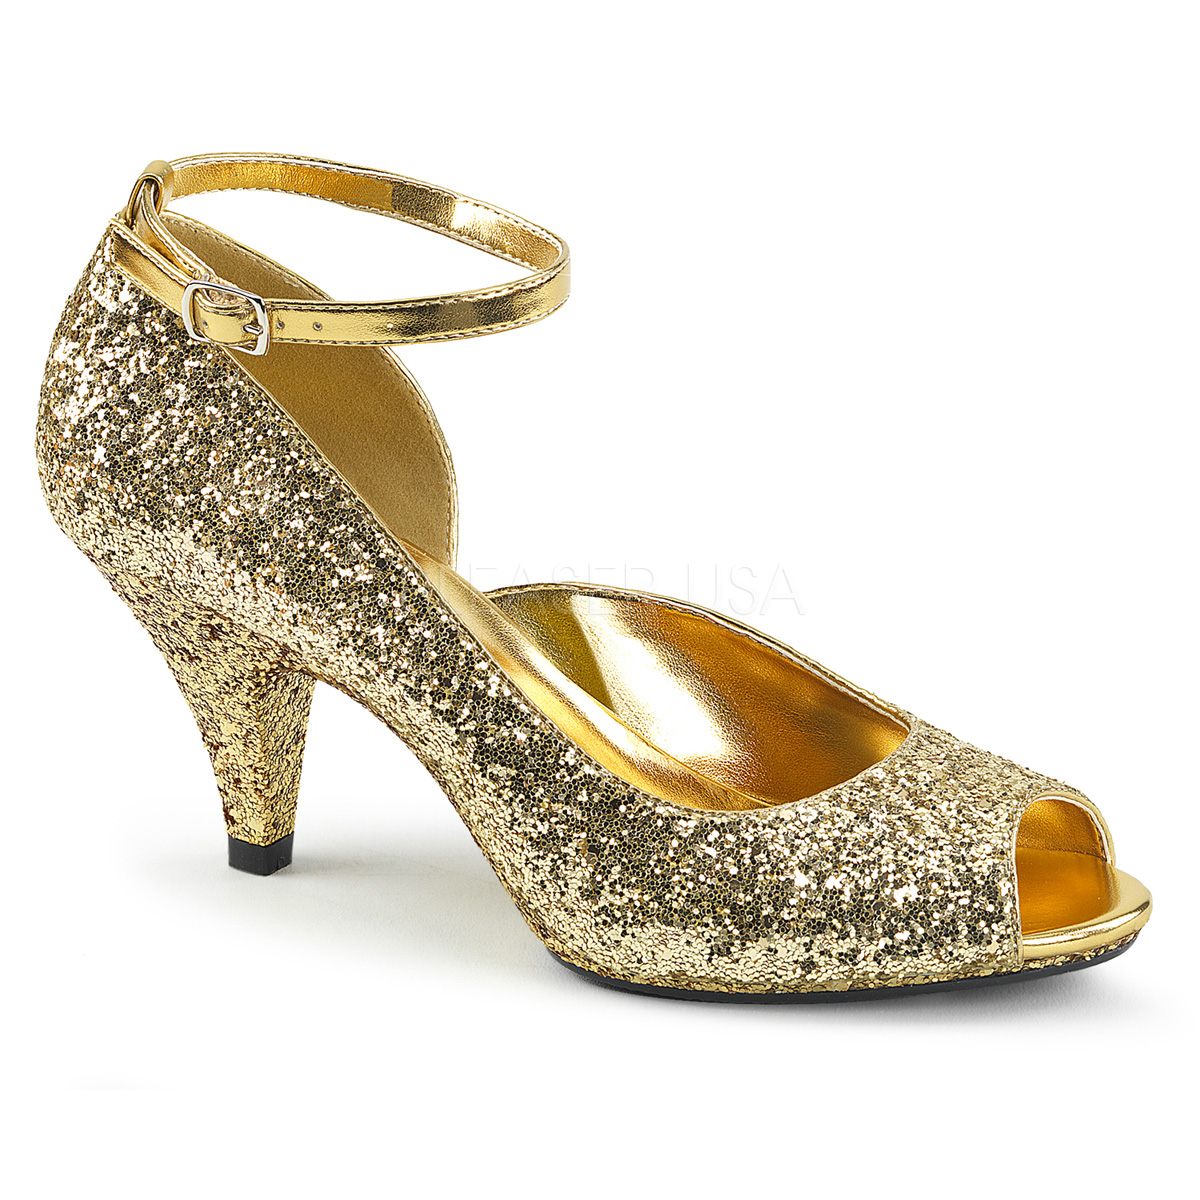 683dee4c20f Gold-Glitter-7-5-cm-BELLE-381G-womens-peep-toe-pumps-shoes-10304_0.jpg